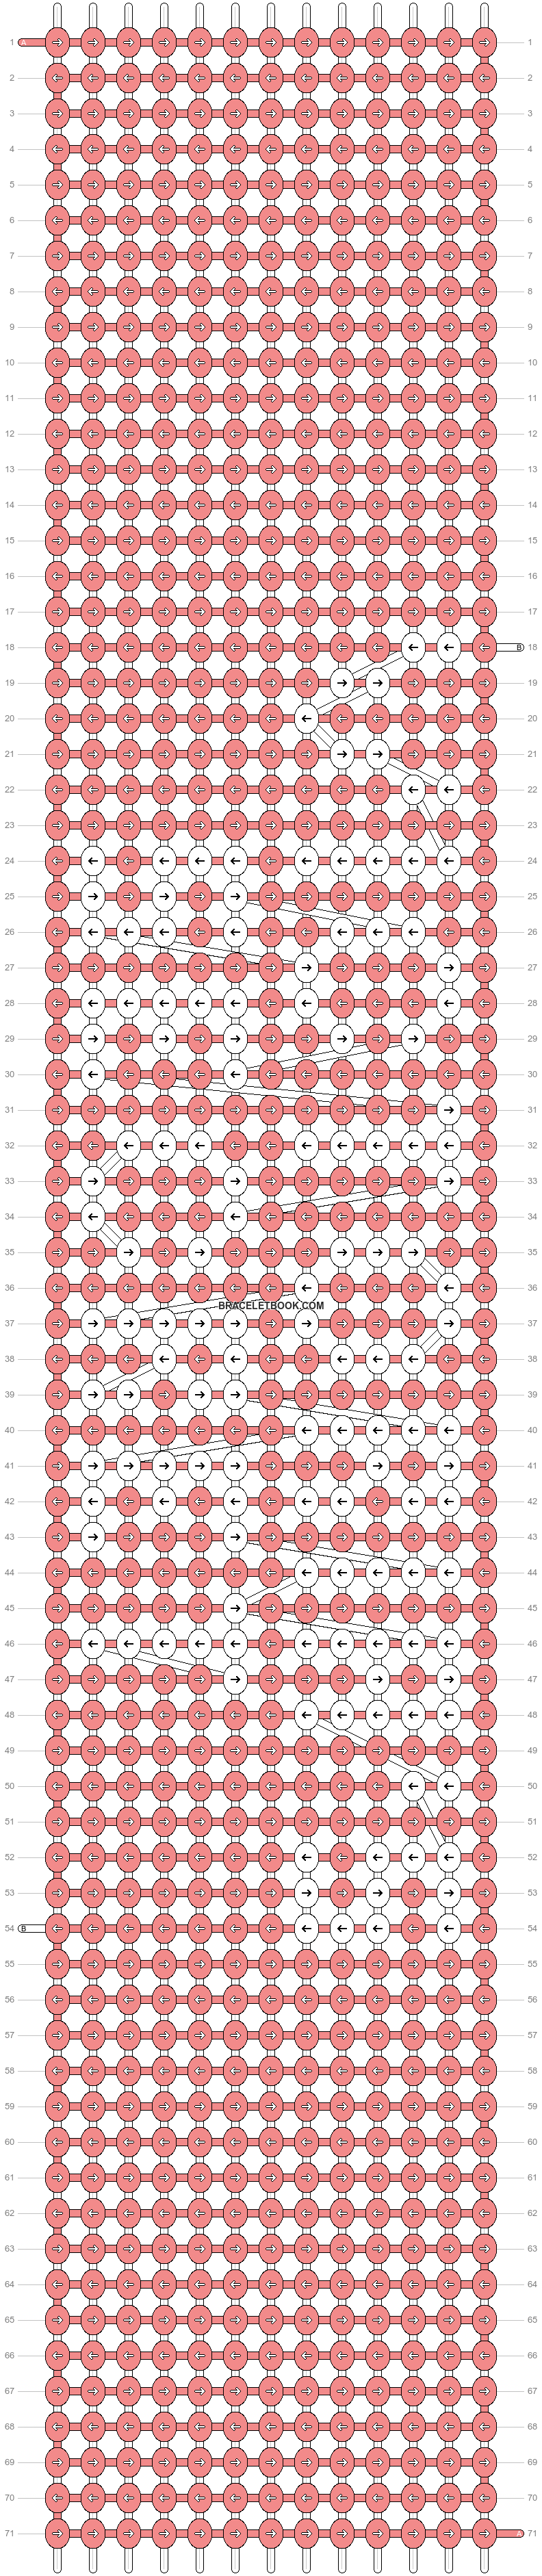 Alpha pattern #6679 pattern